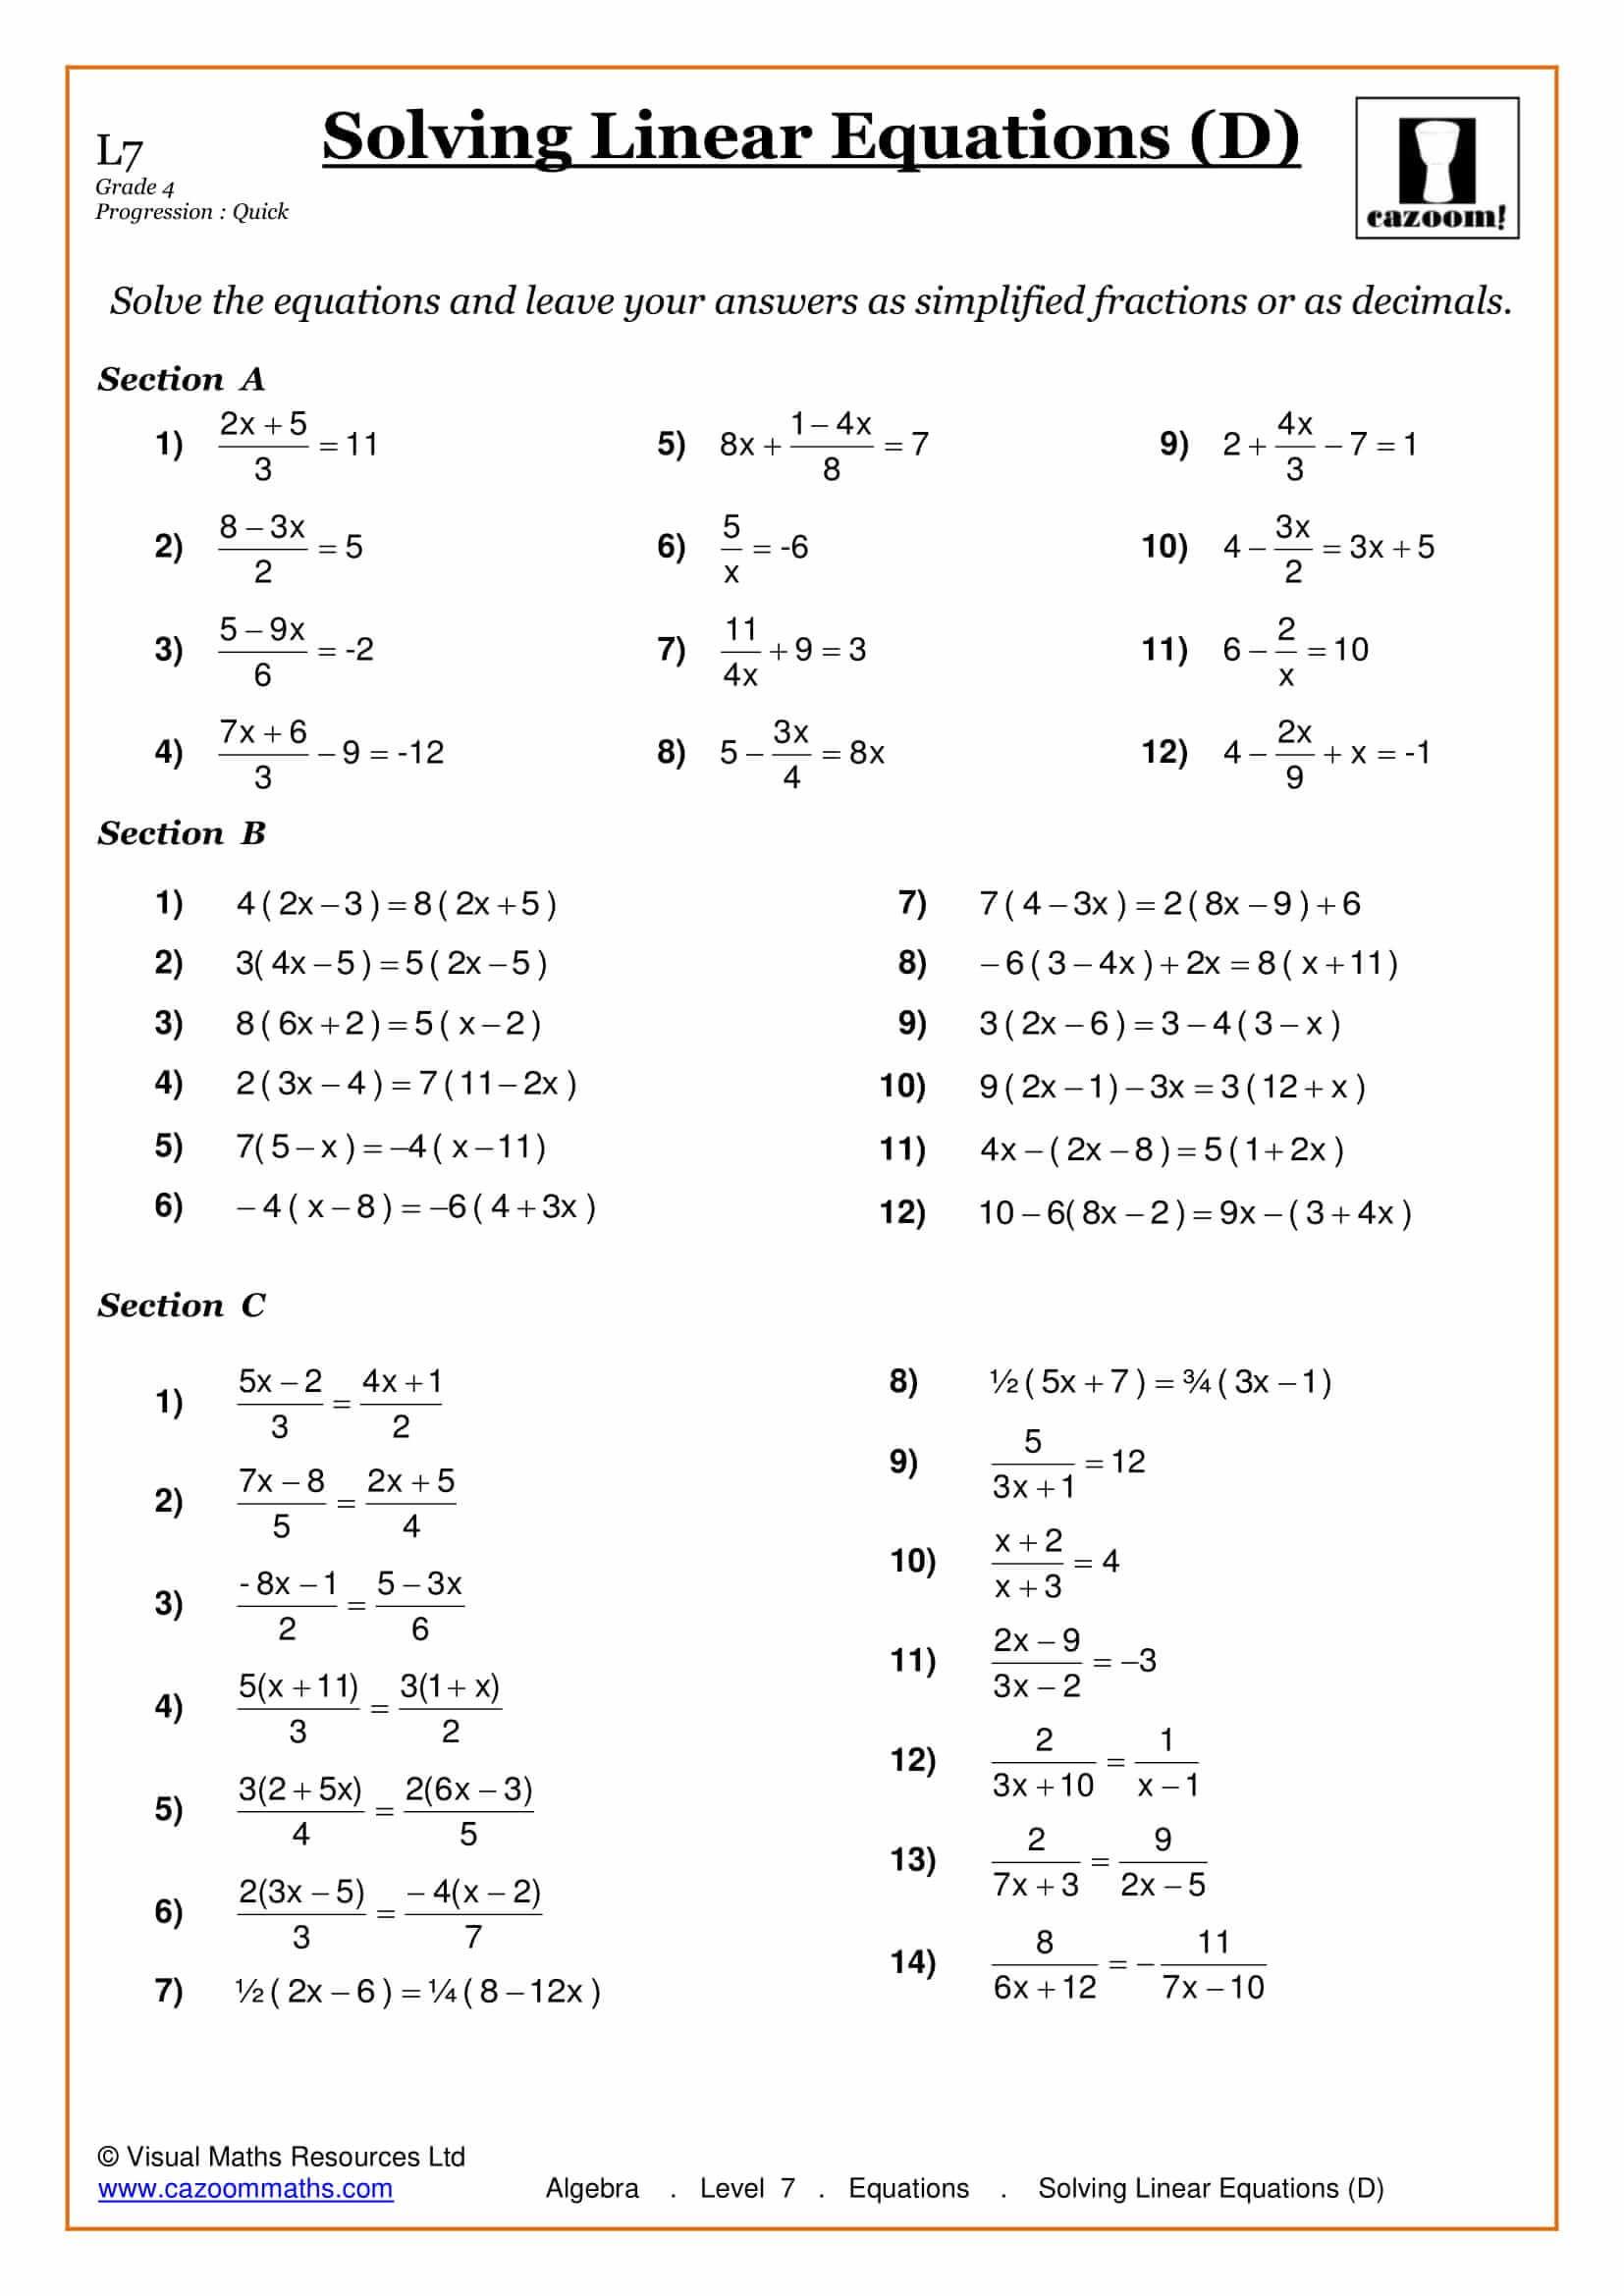 Solving Equations Maths Worksheet - cazoommaths.com   Algebra worksheets [ 2339 x 1654 Pixel ]